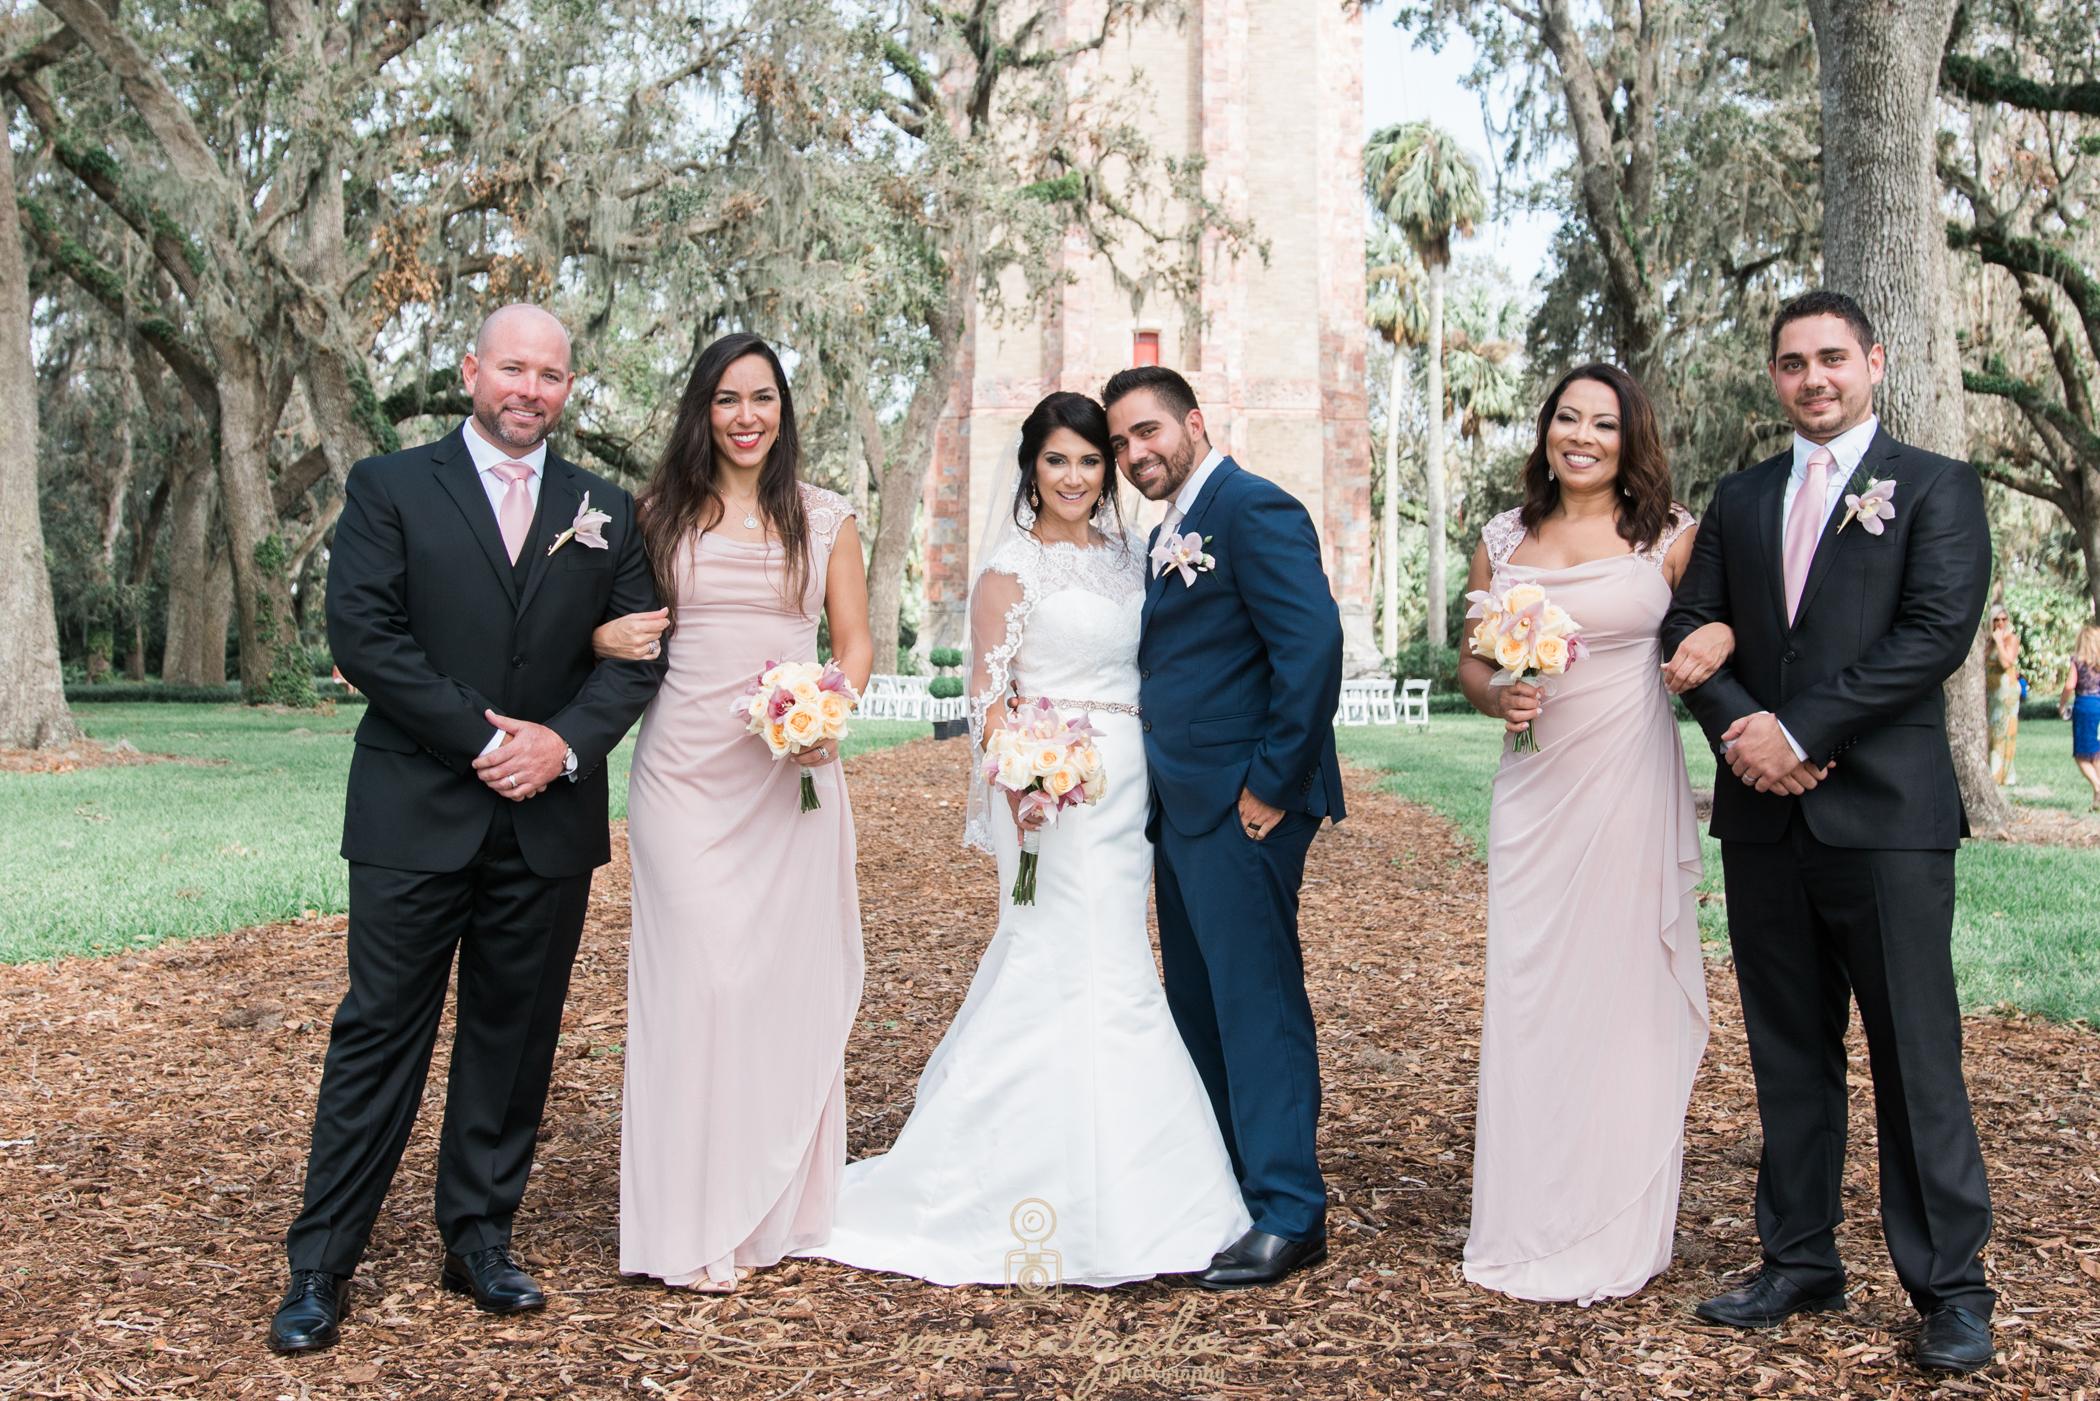 Bok-tower-gardens-wedding-photo, bridal-part-wedding-photo, Tampa-wedding-photo